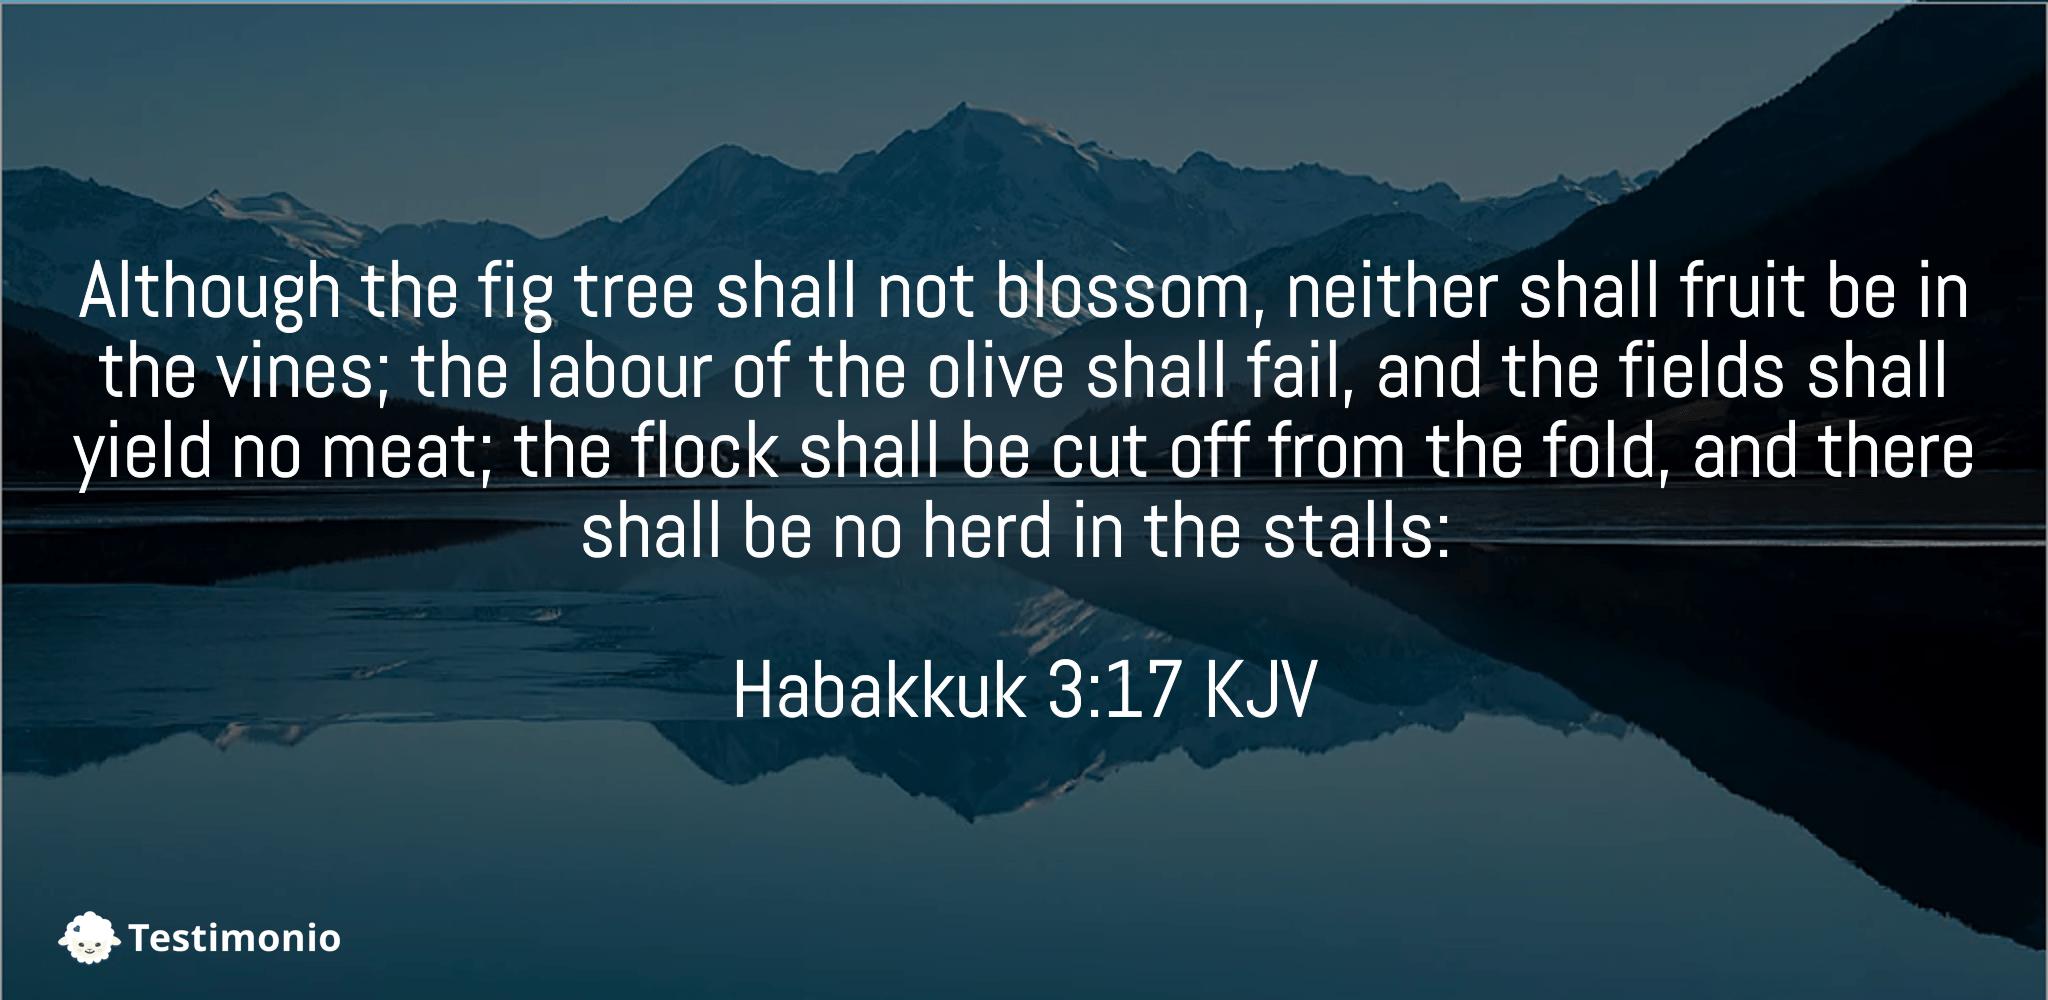 Habakkuk 3:17